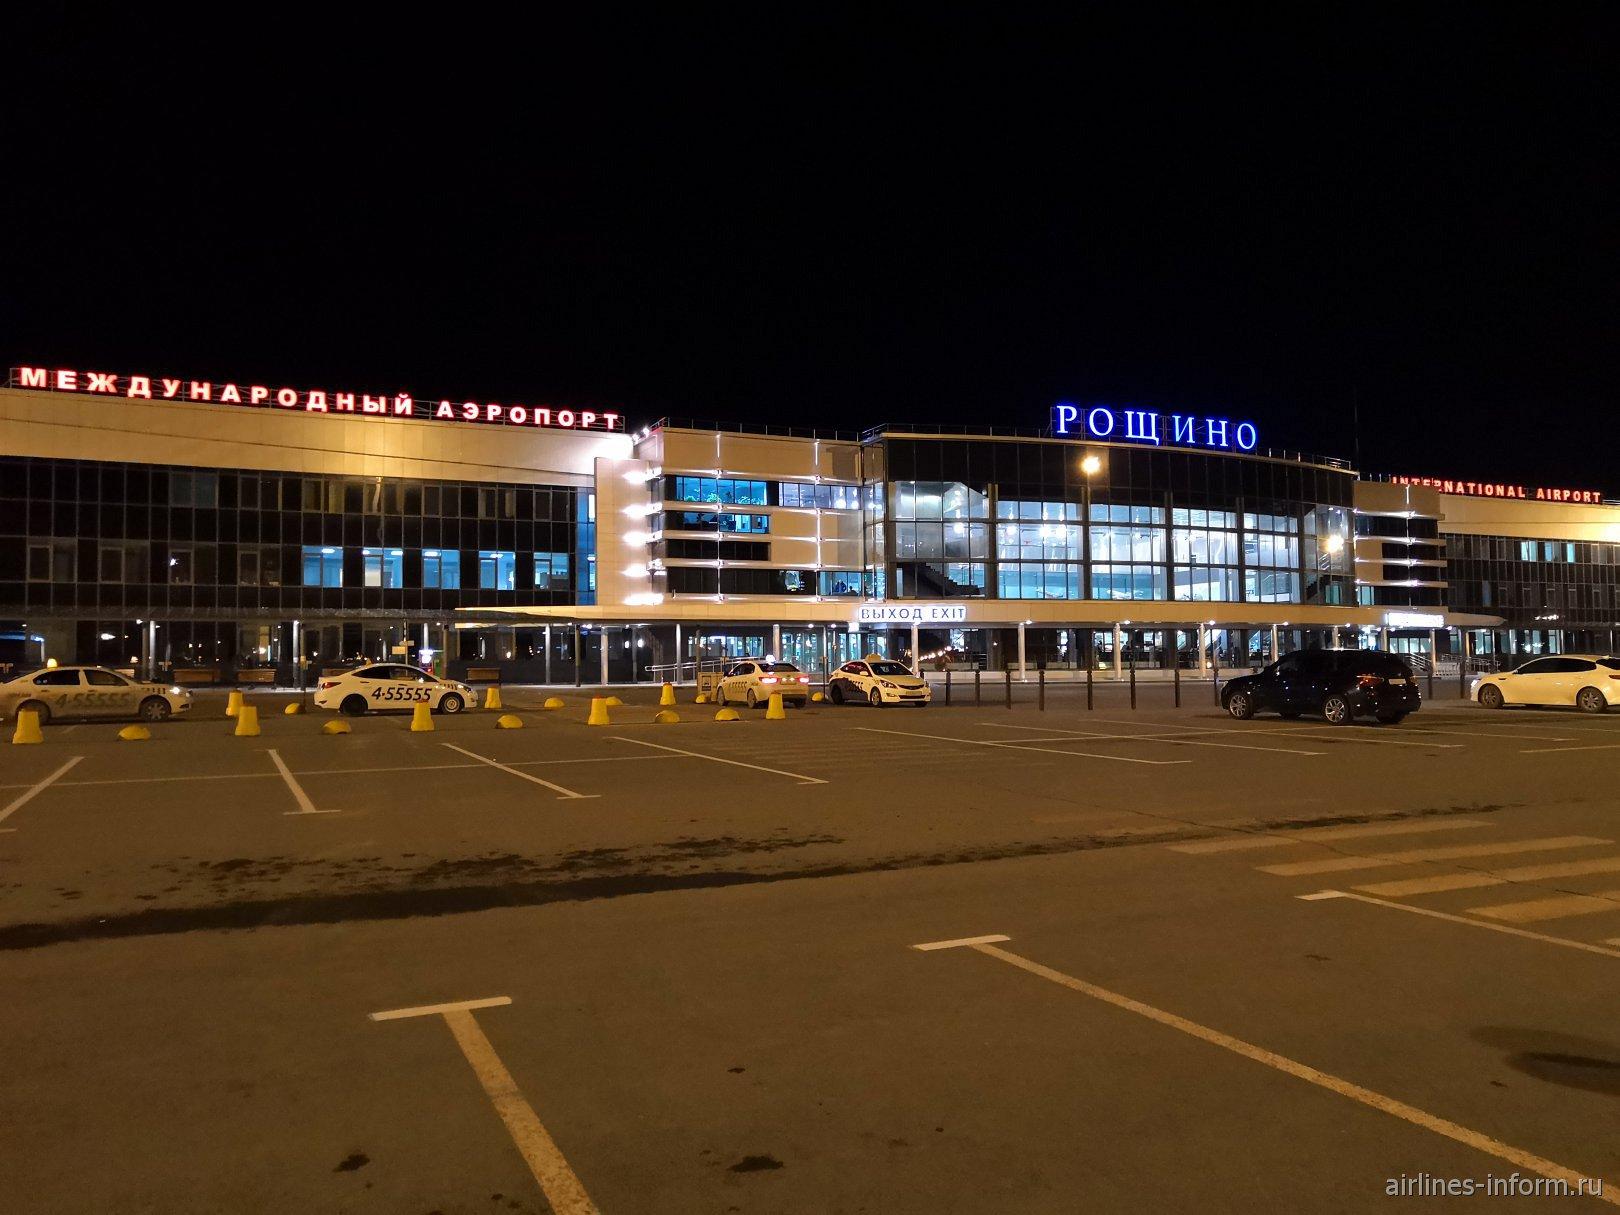 Аэровокзал международного аэропорта Тюмень Рощино